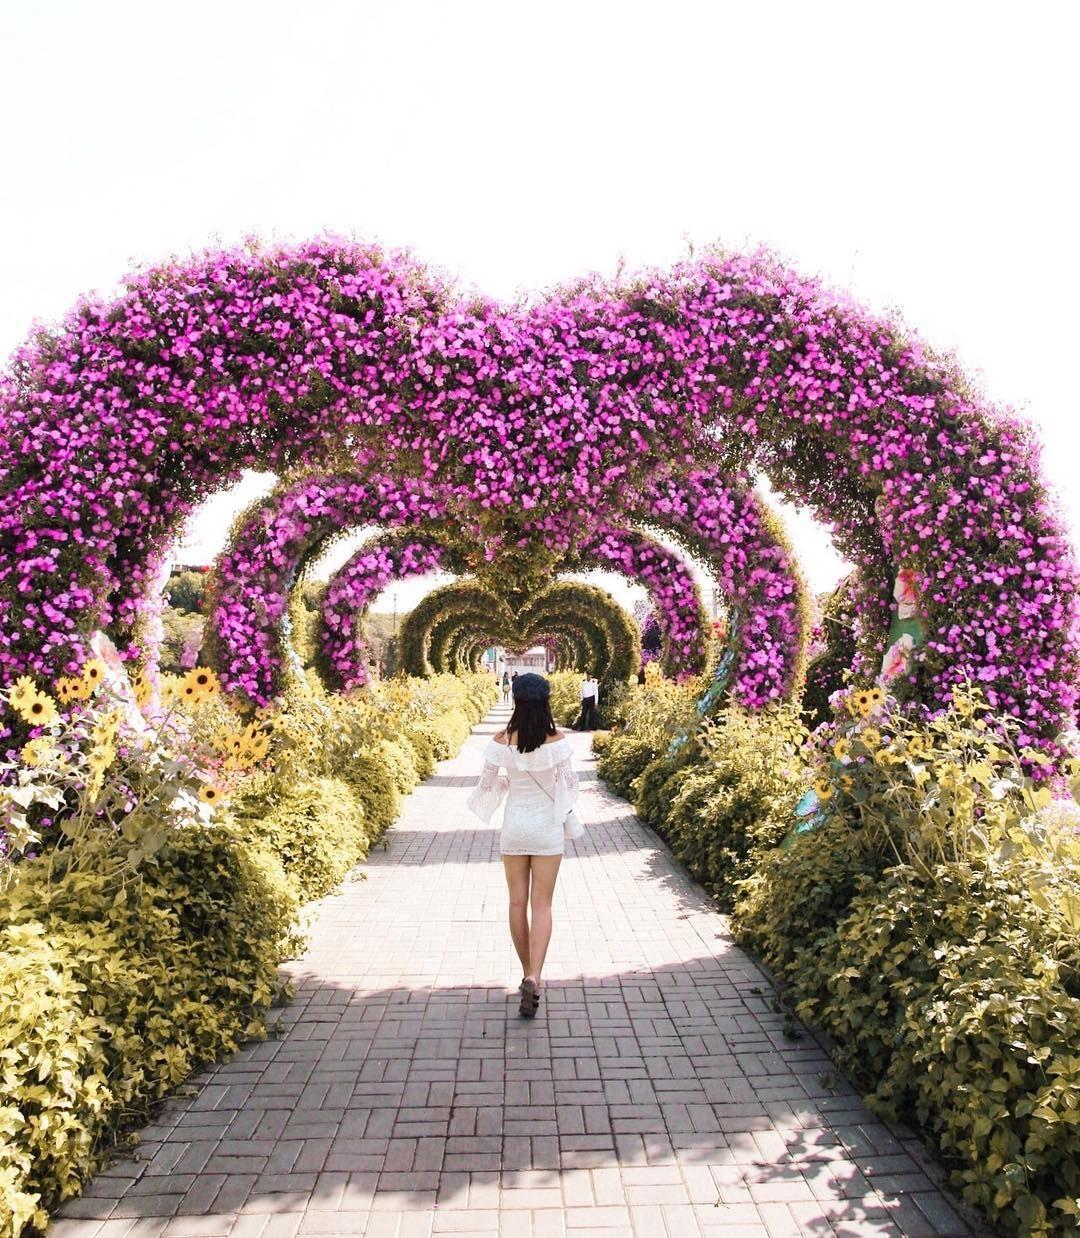 Dubai Miracle Garden UAE